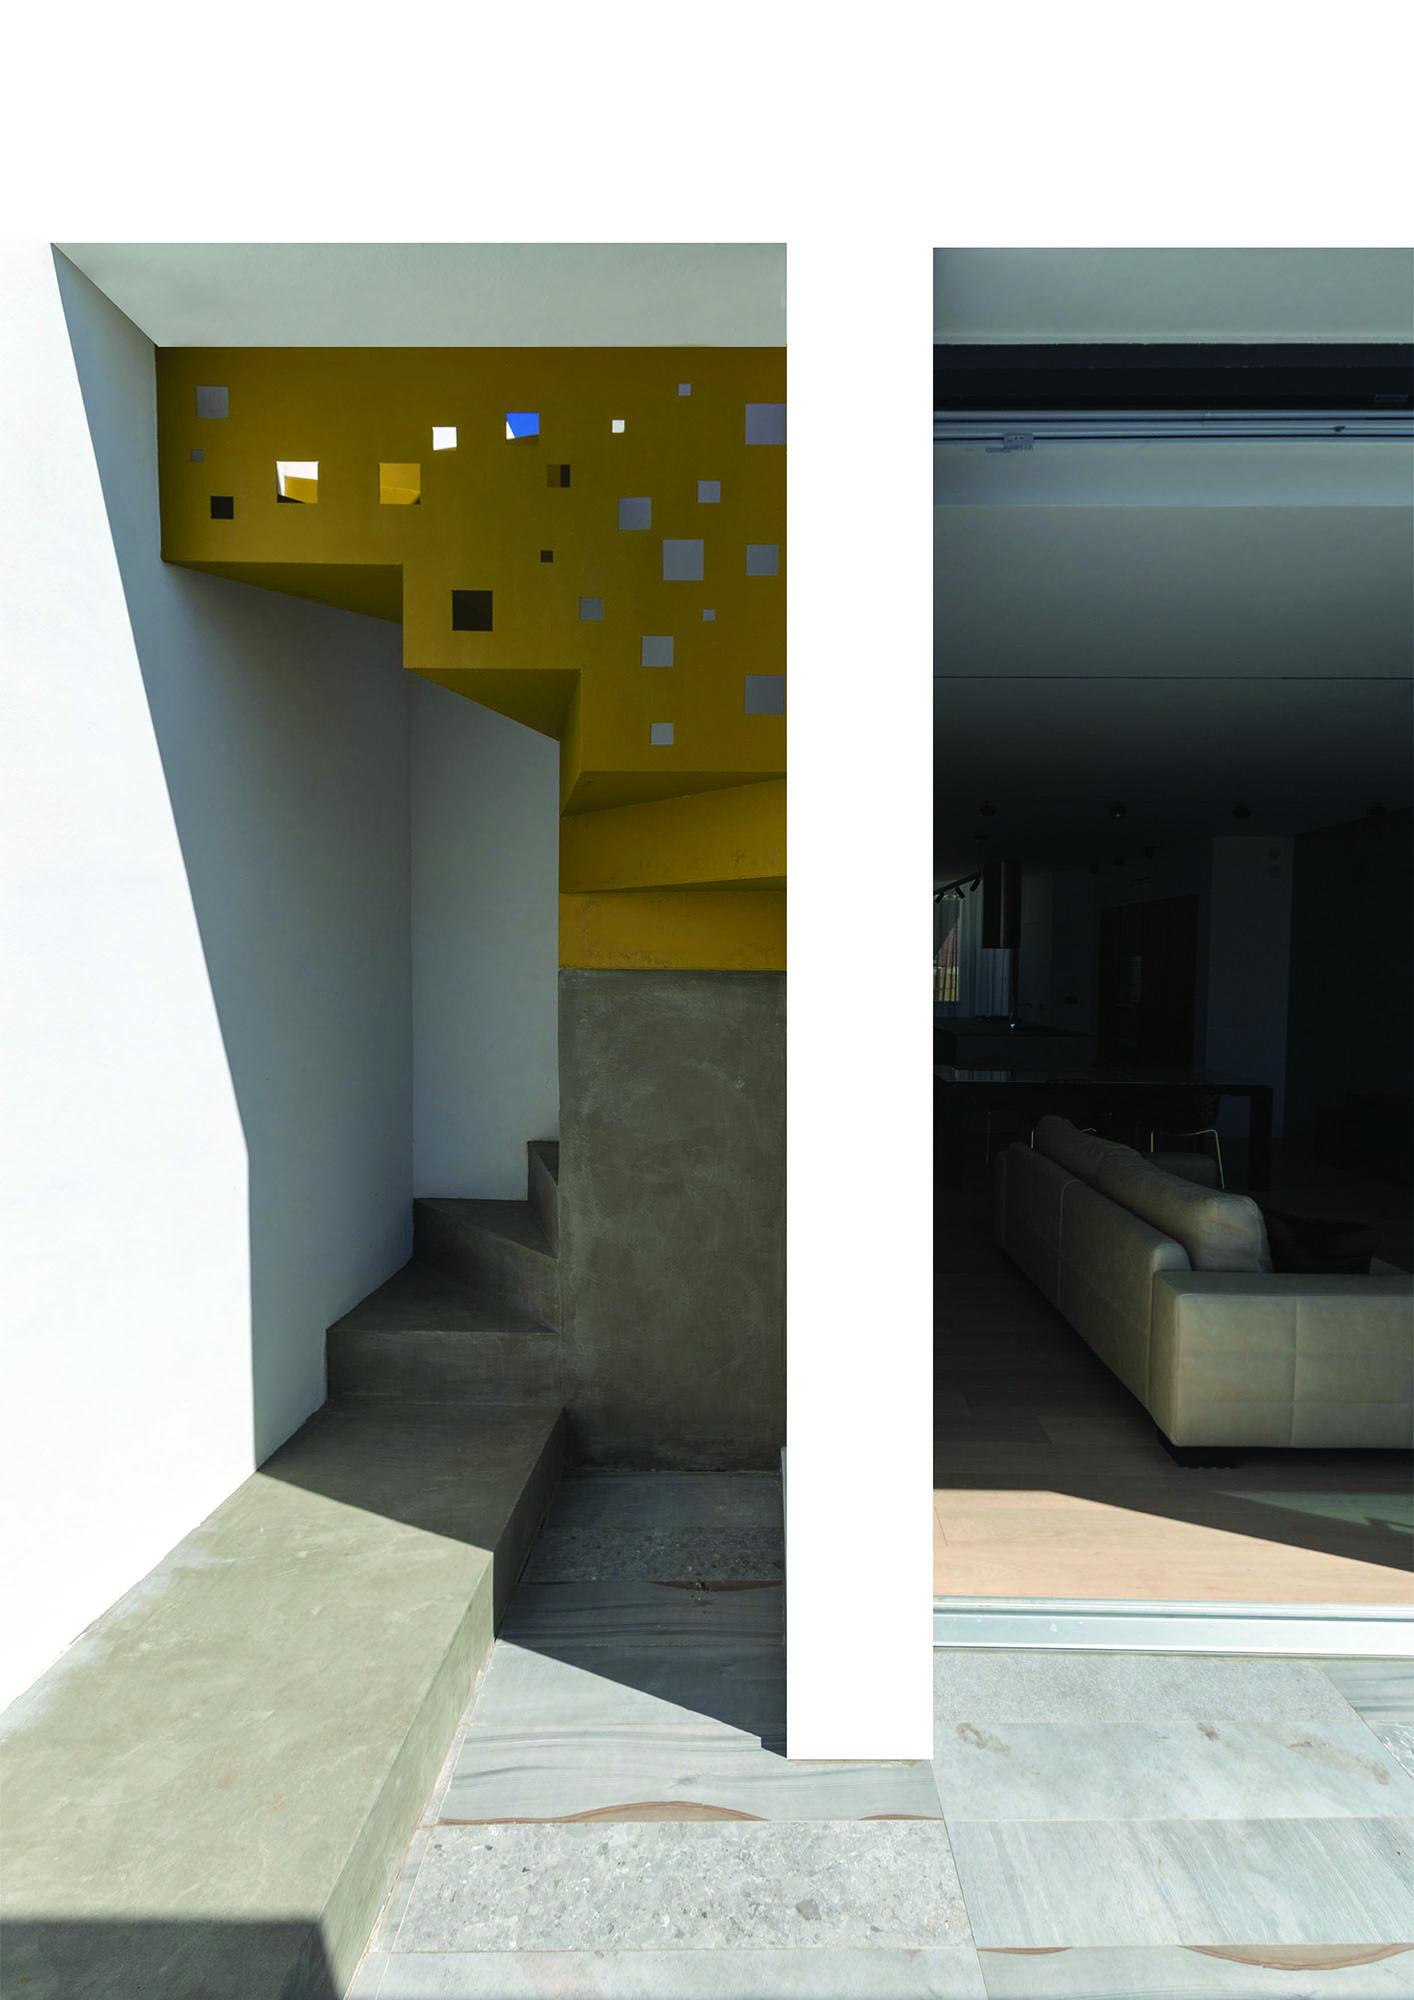 Dettaglio architettonico, scala solarium – Architectural detail, solarium's staircase